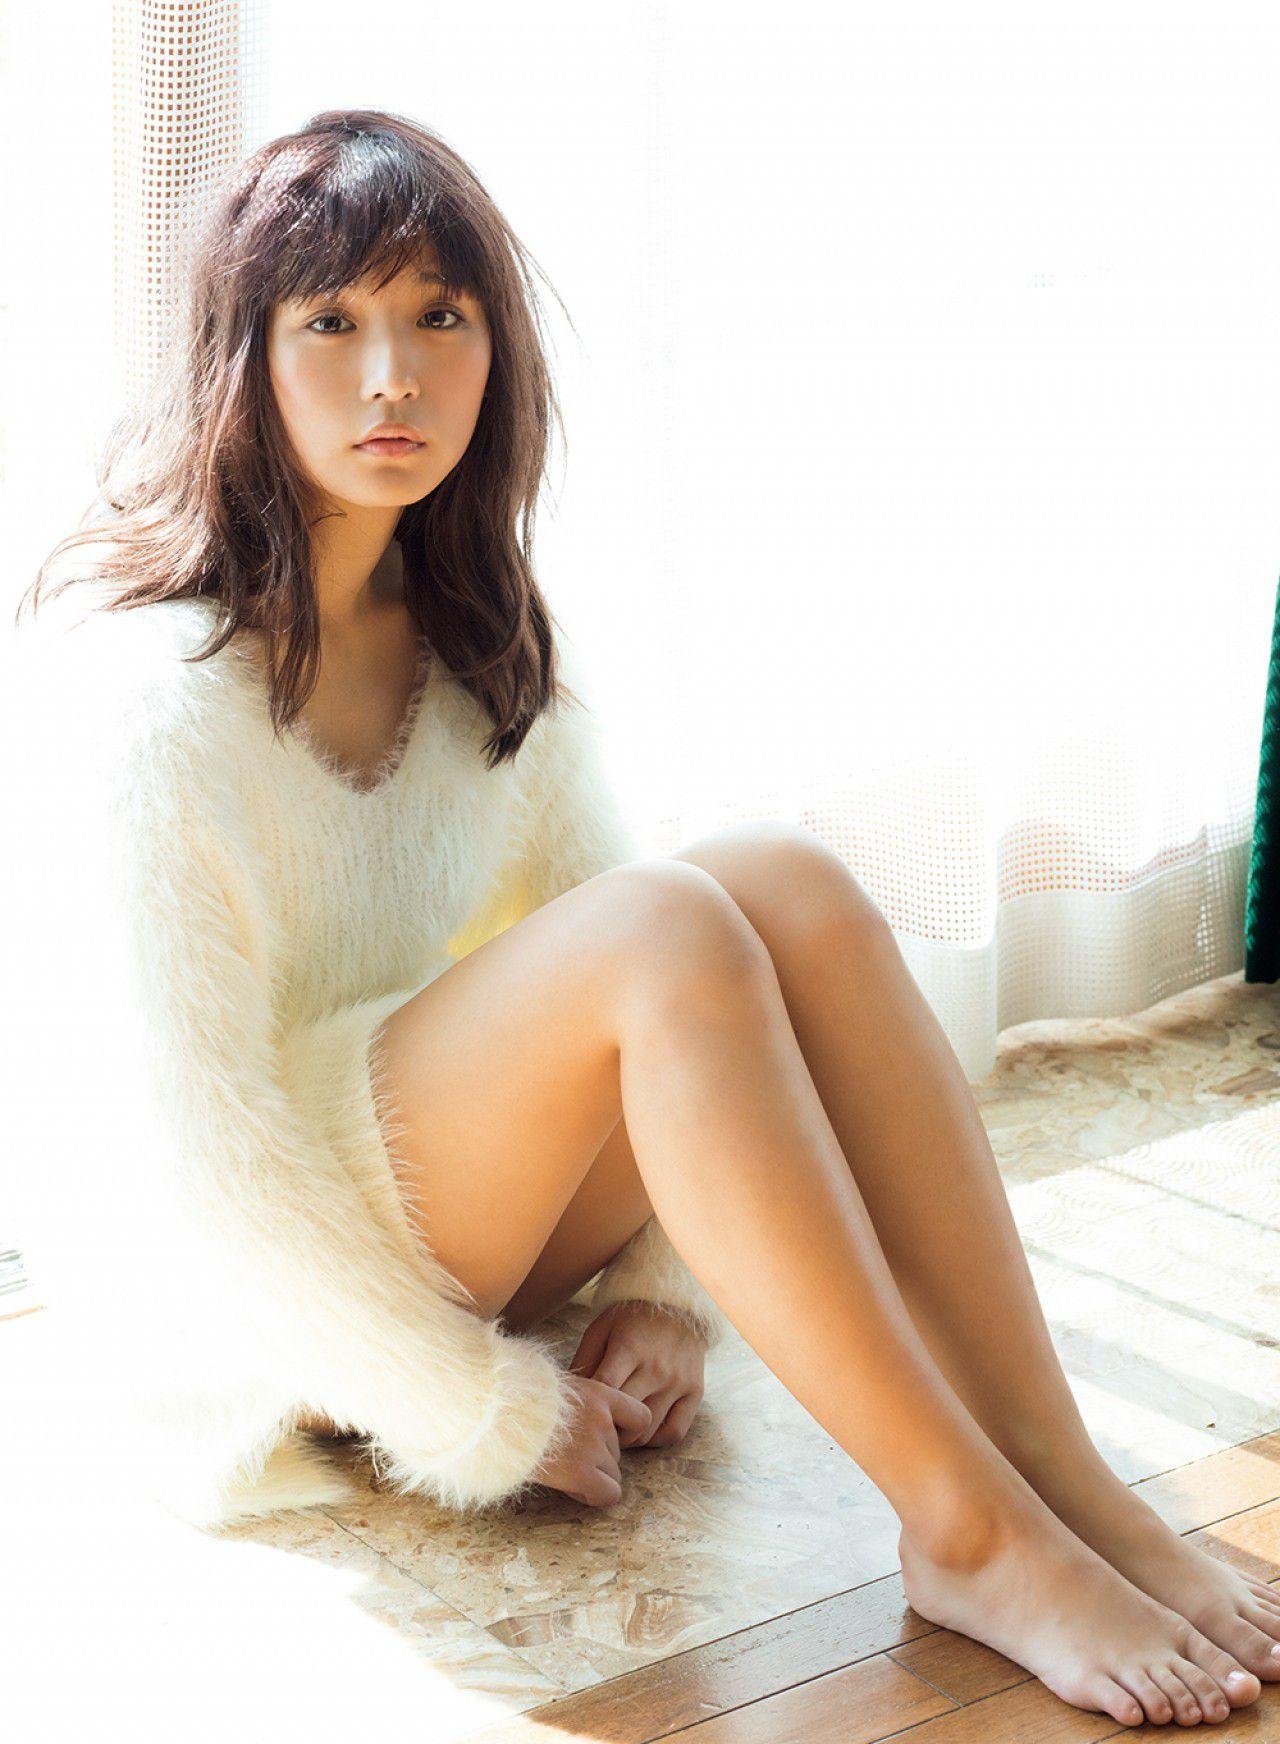 VOL.976 [FRIDAY]极品妹子日本嫩模:浅川梨奈超高清写真套图(20P)